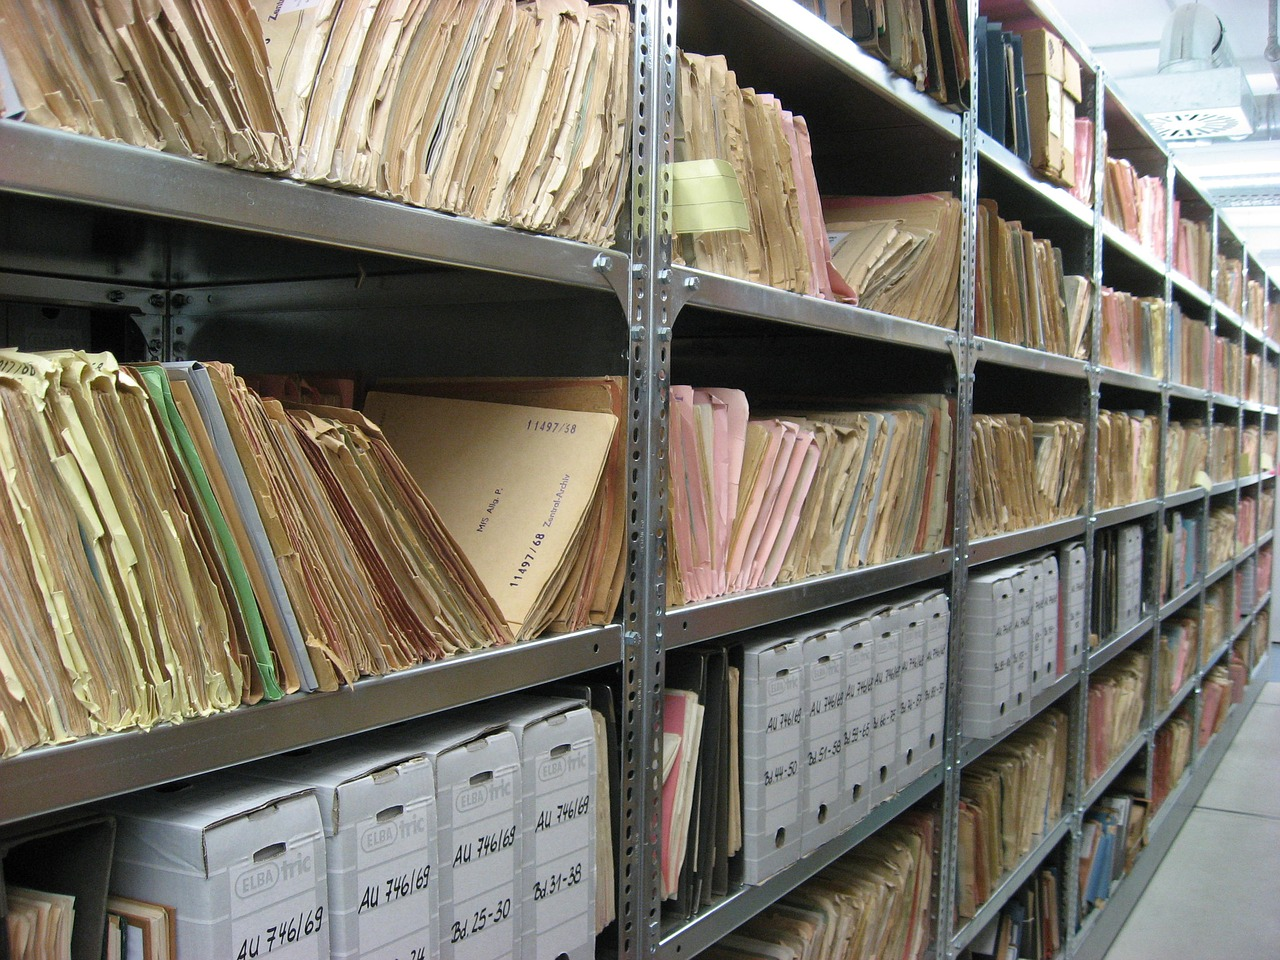 Files Ddr Archive Files Files  - creativesignature / Pixabay